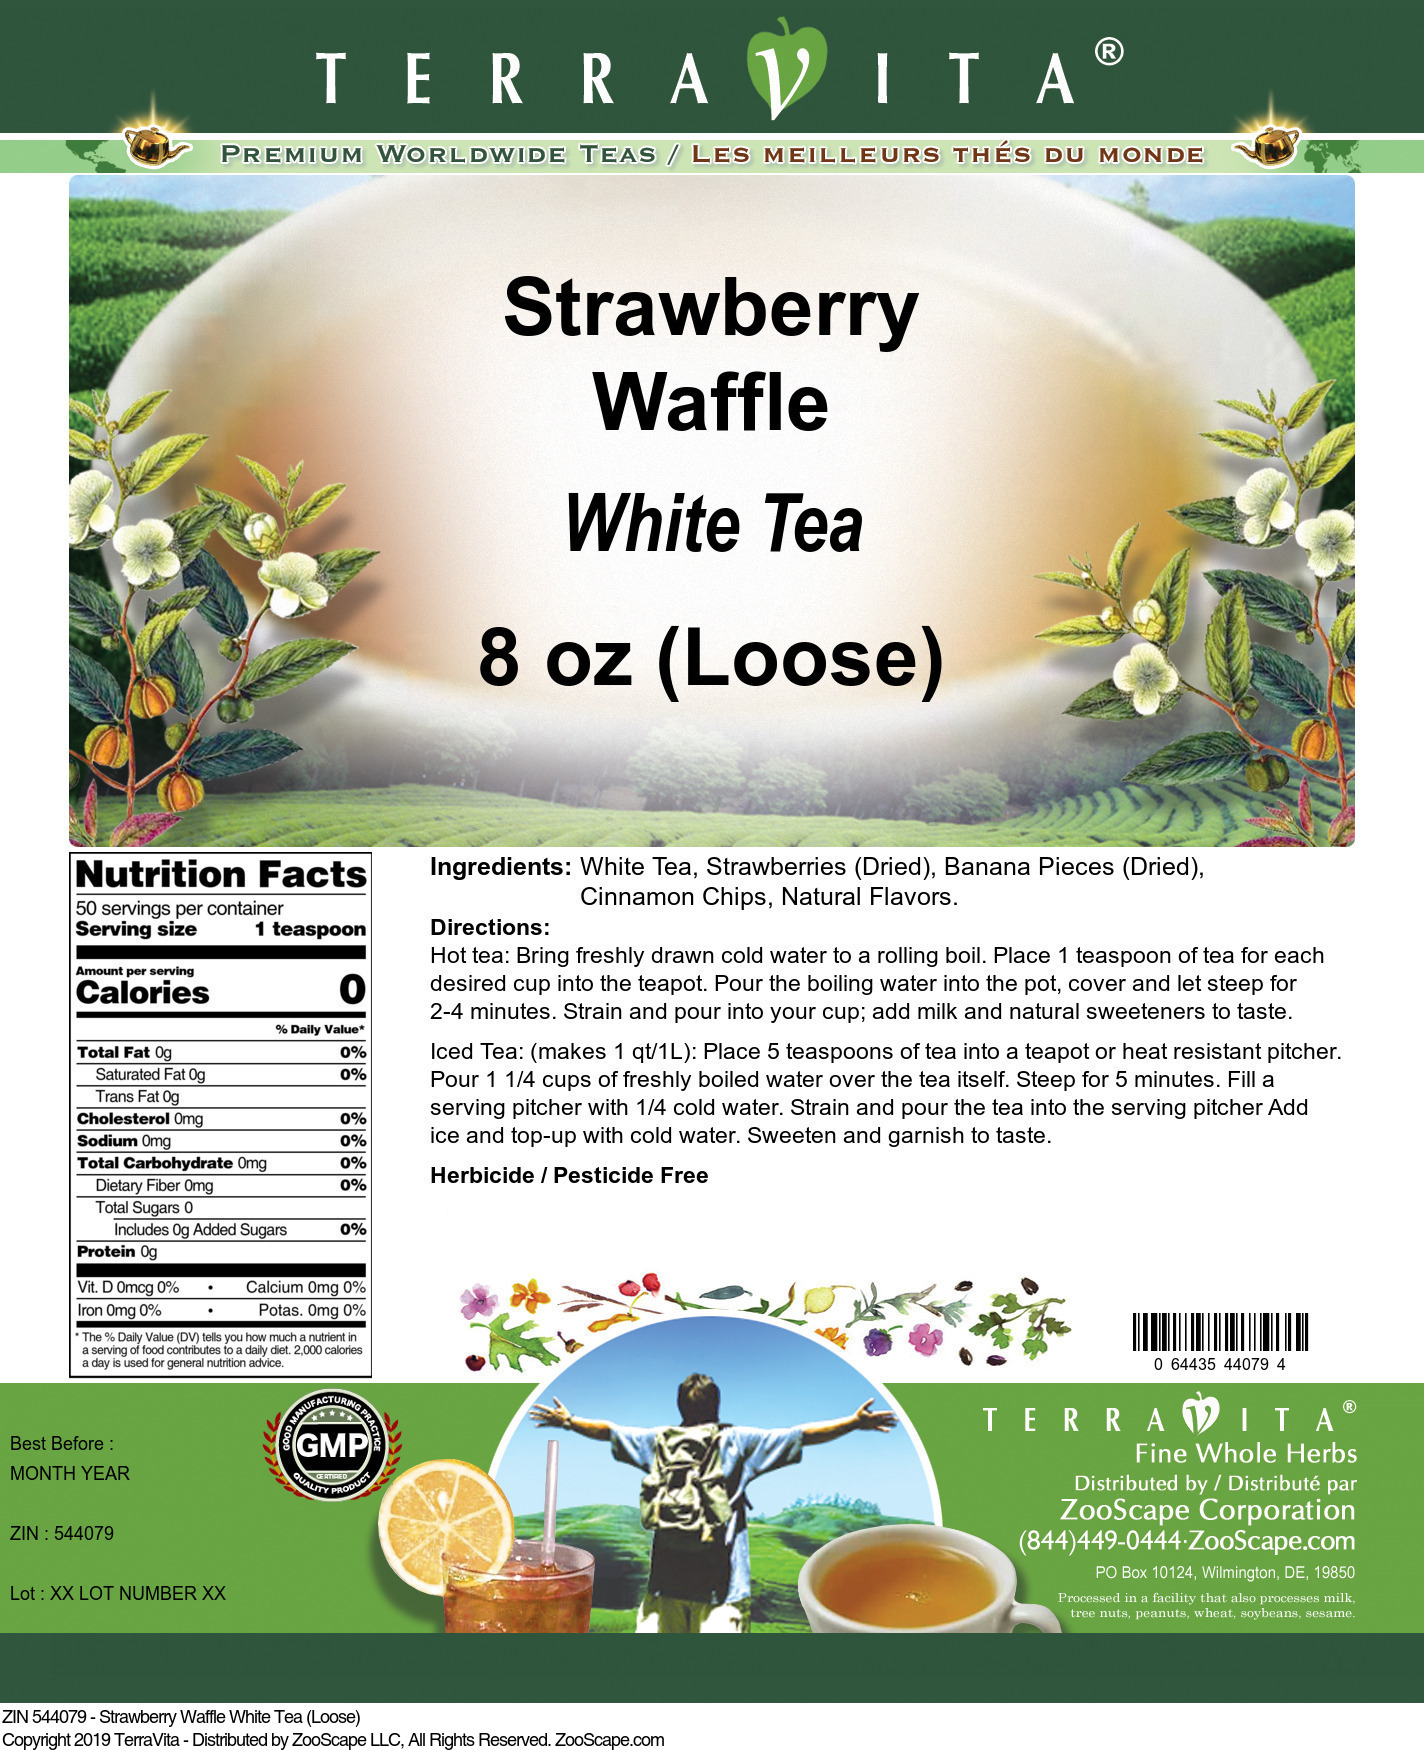 Strawberry Waffle White Tea